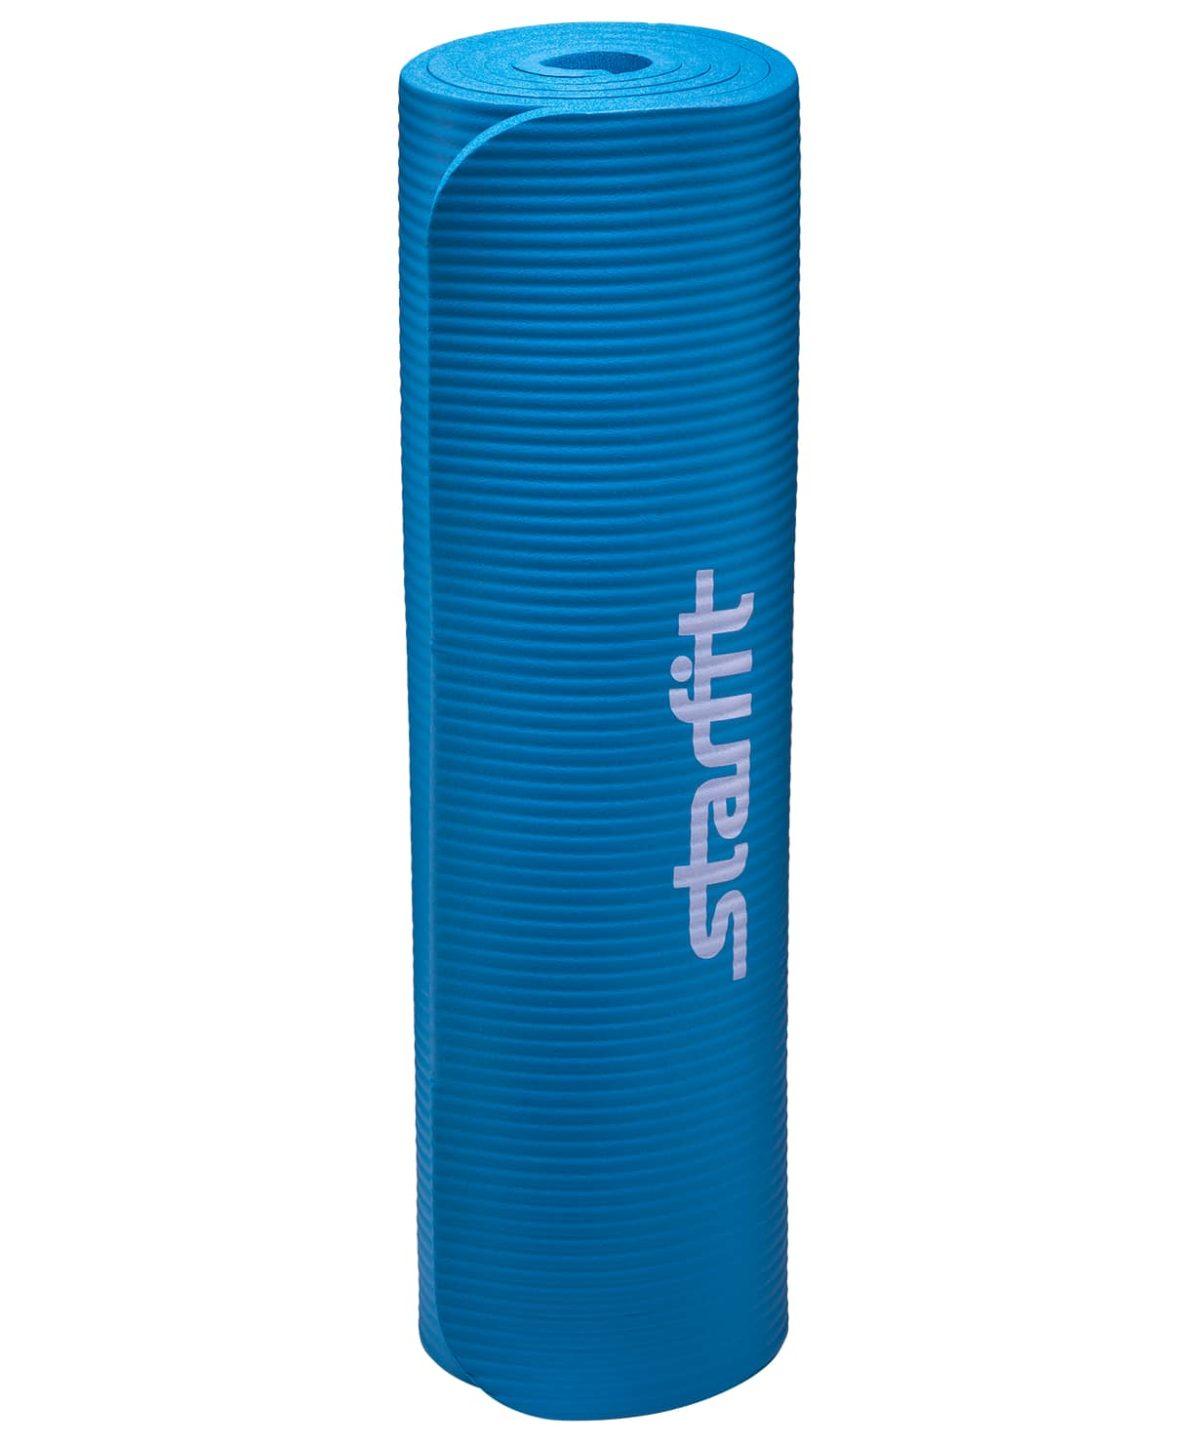 STARFIT Коврик для йоги FM-301 183x58x1,2 см: синий - 3